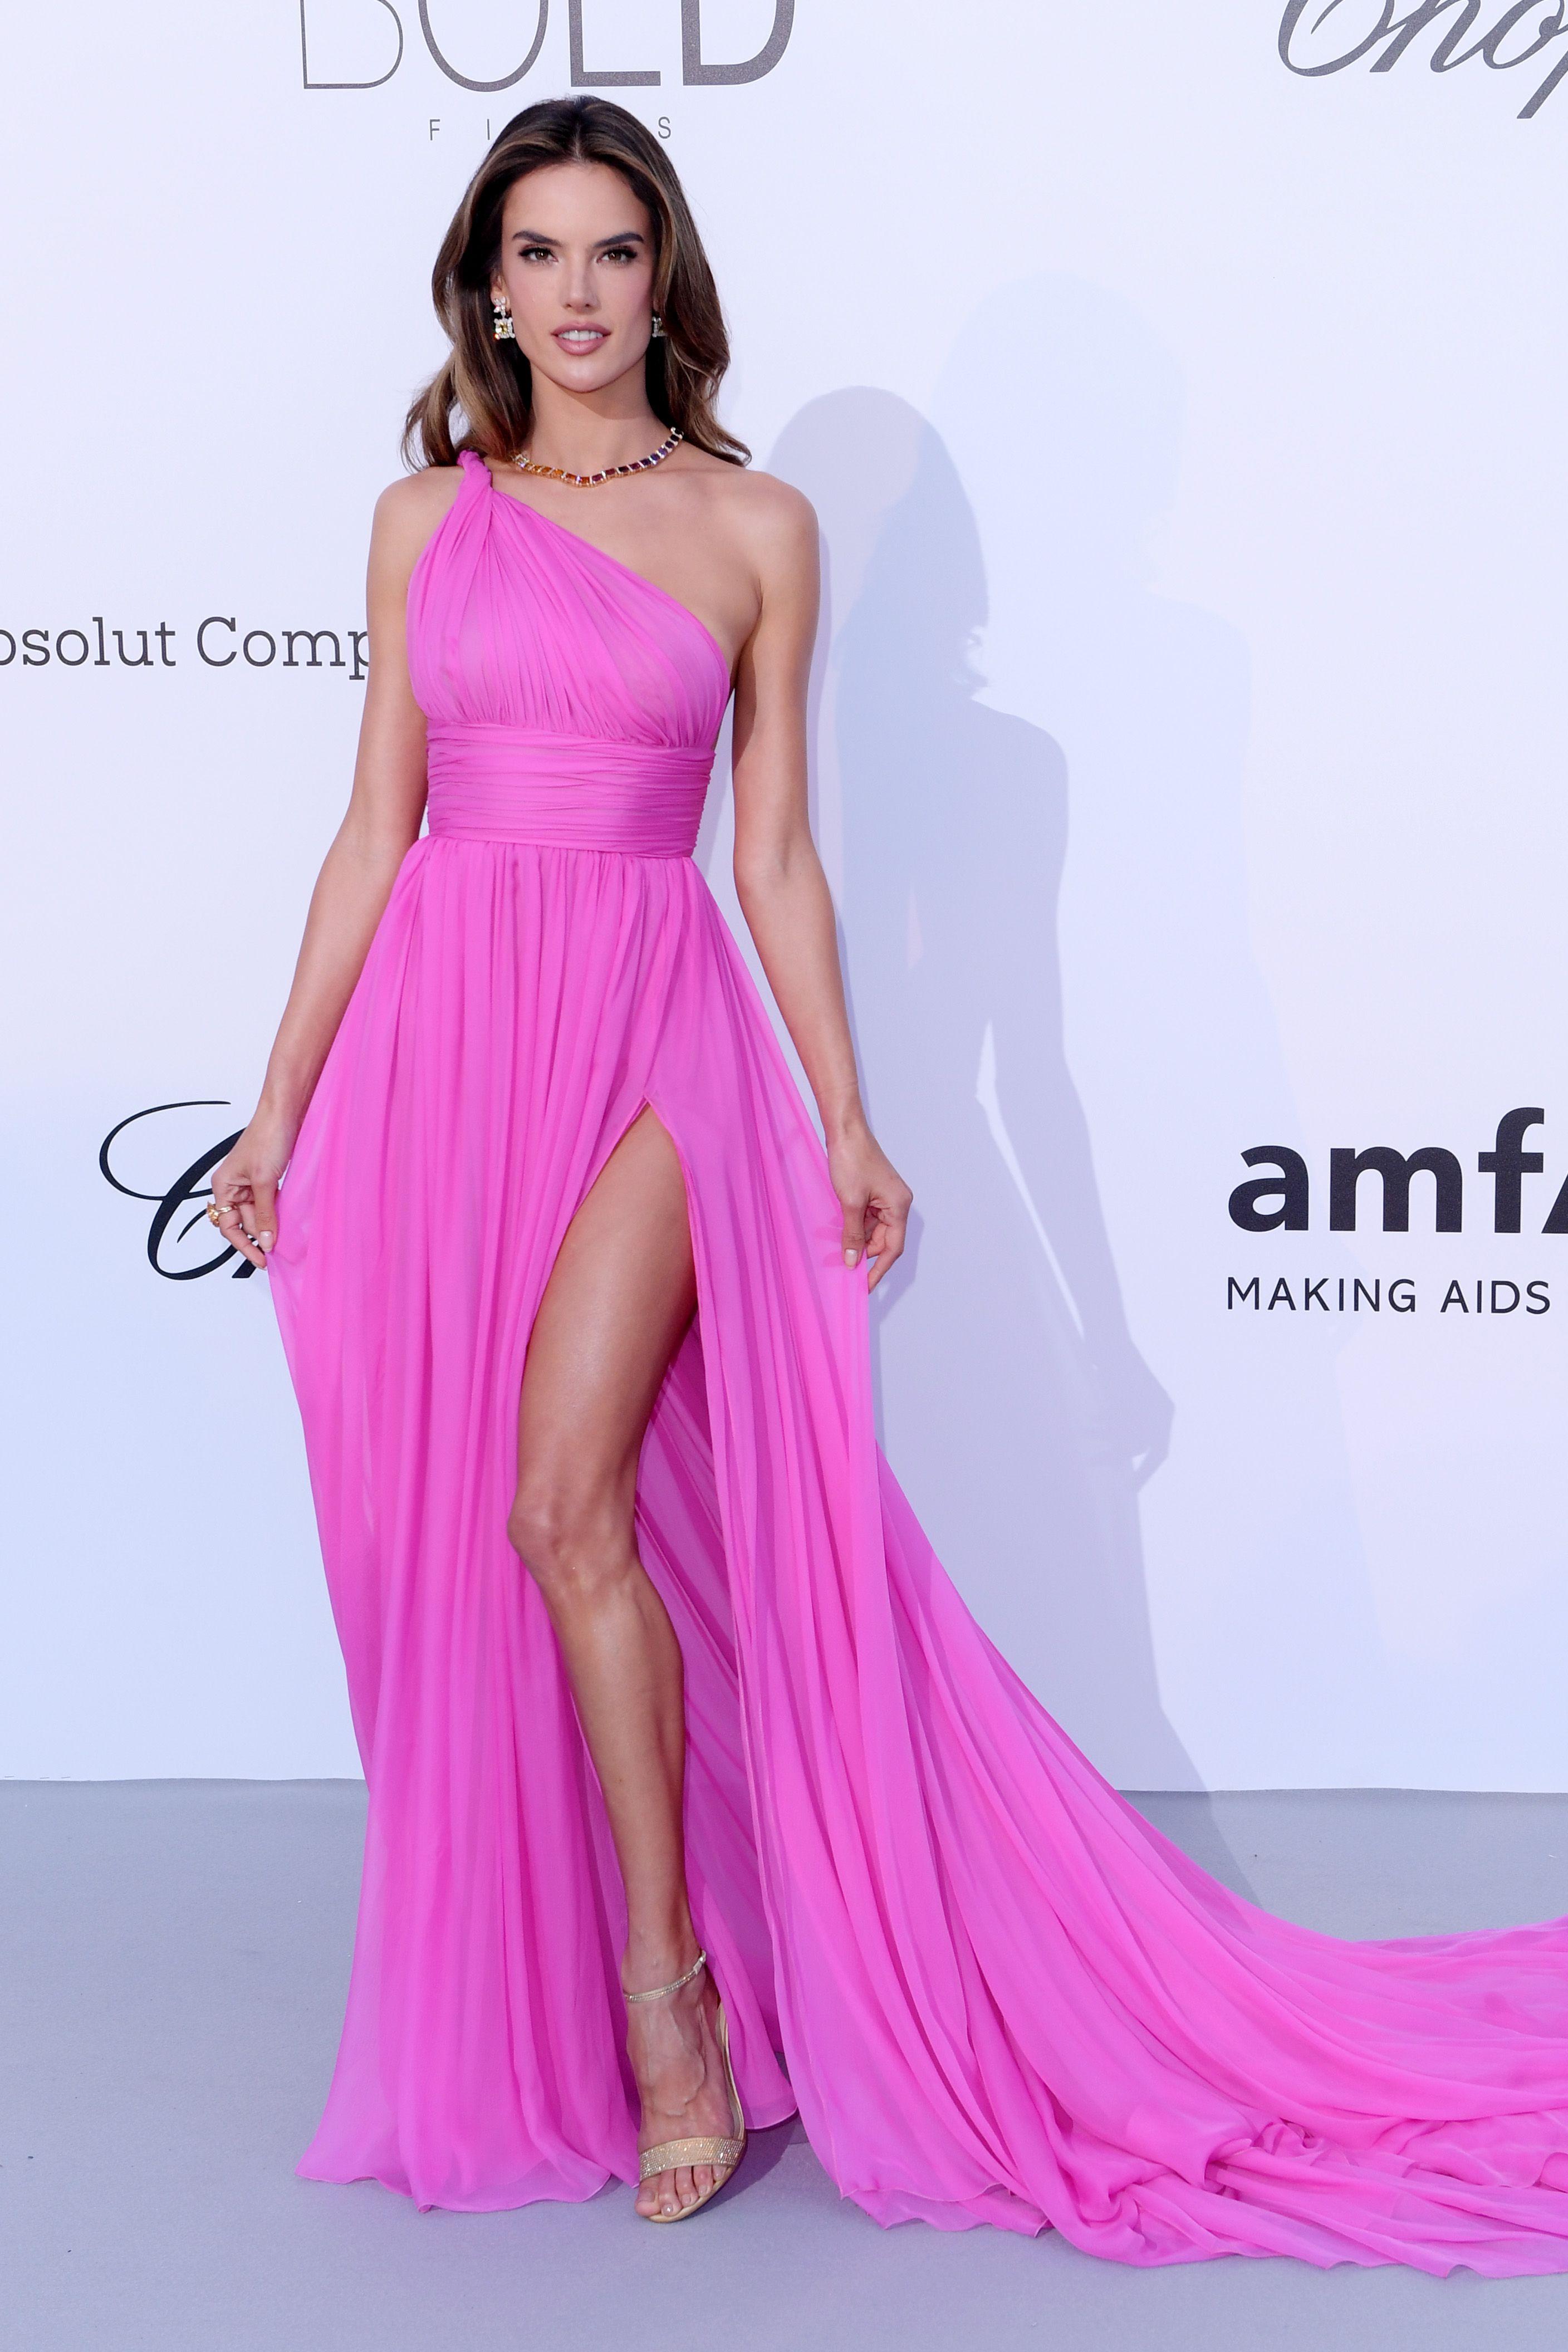 027428b106 Alessandra Ambrosio at the 25th amfAR Gala Cannes 2018 #alessandraambrosio  #cannes